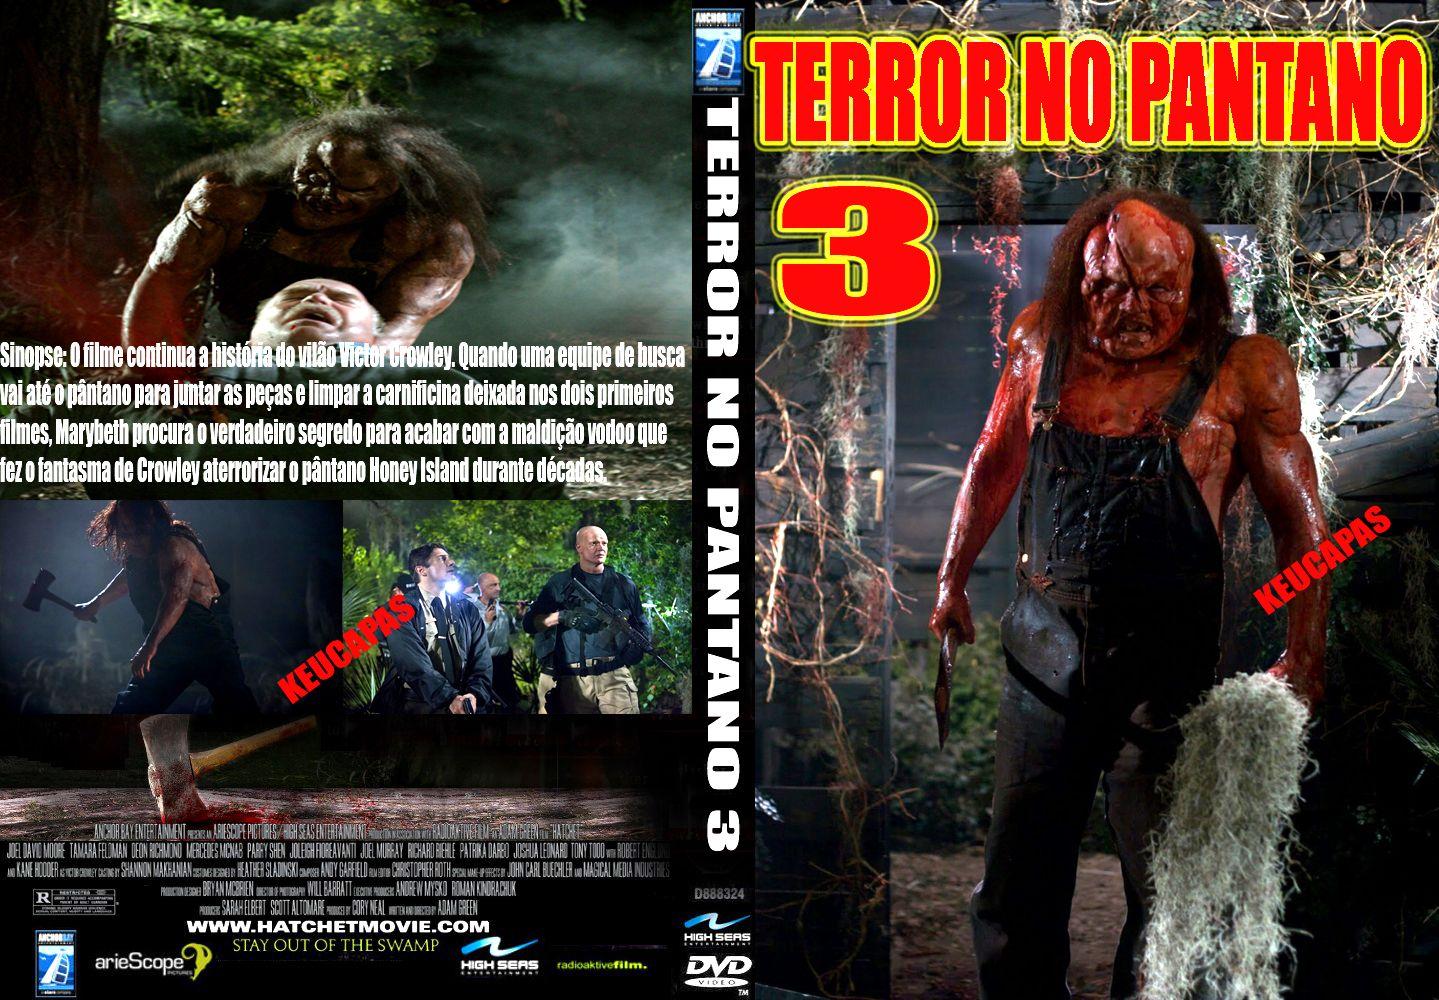 terror no pantano 3 dublado